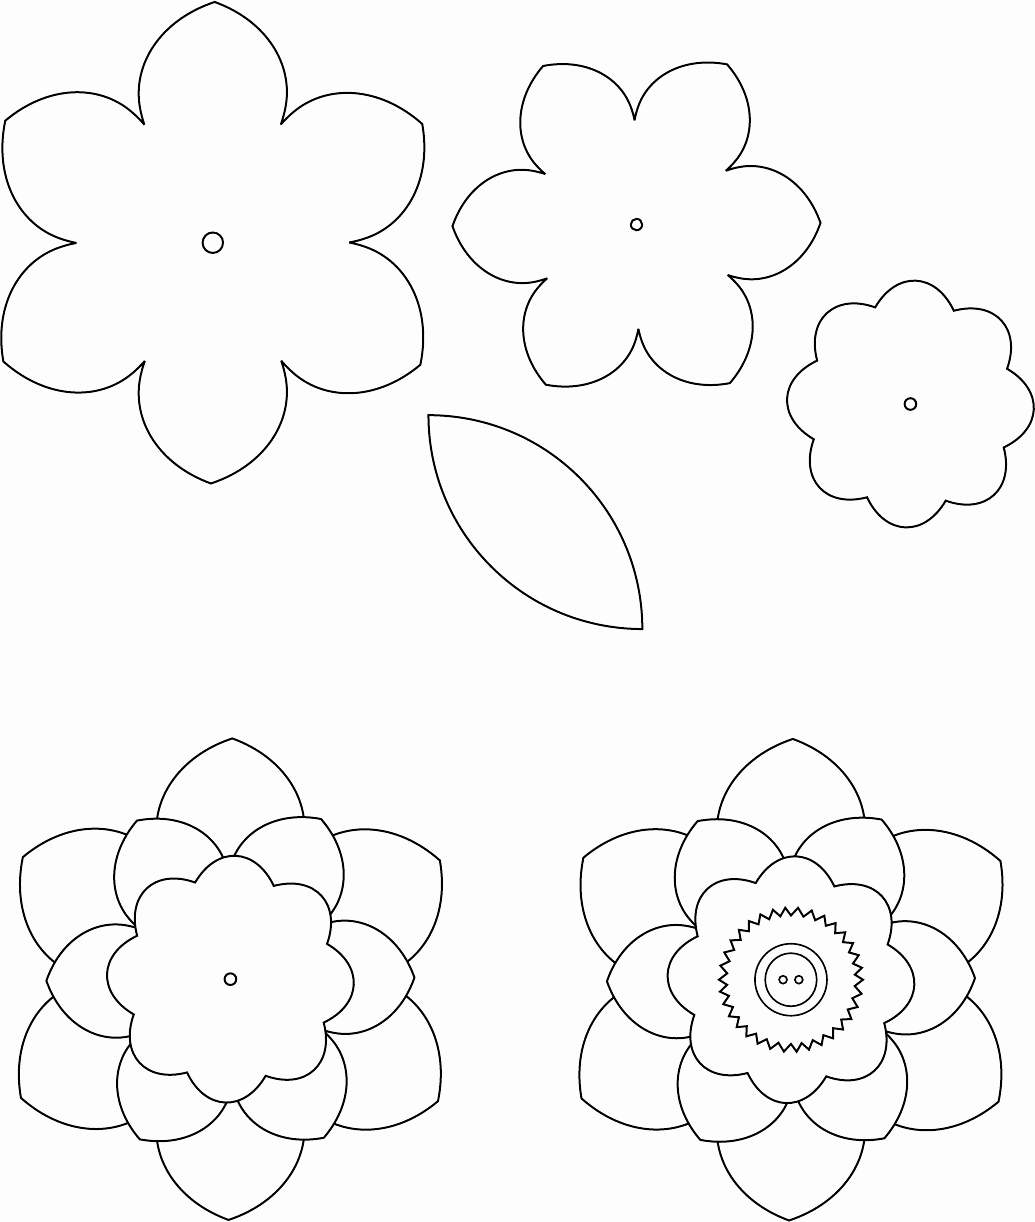 Paper Flower Template Printable Best Of Flower Template 1 трафареты цветы Pinterest